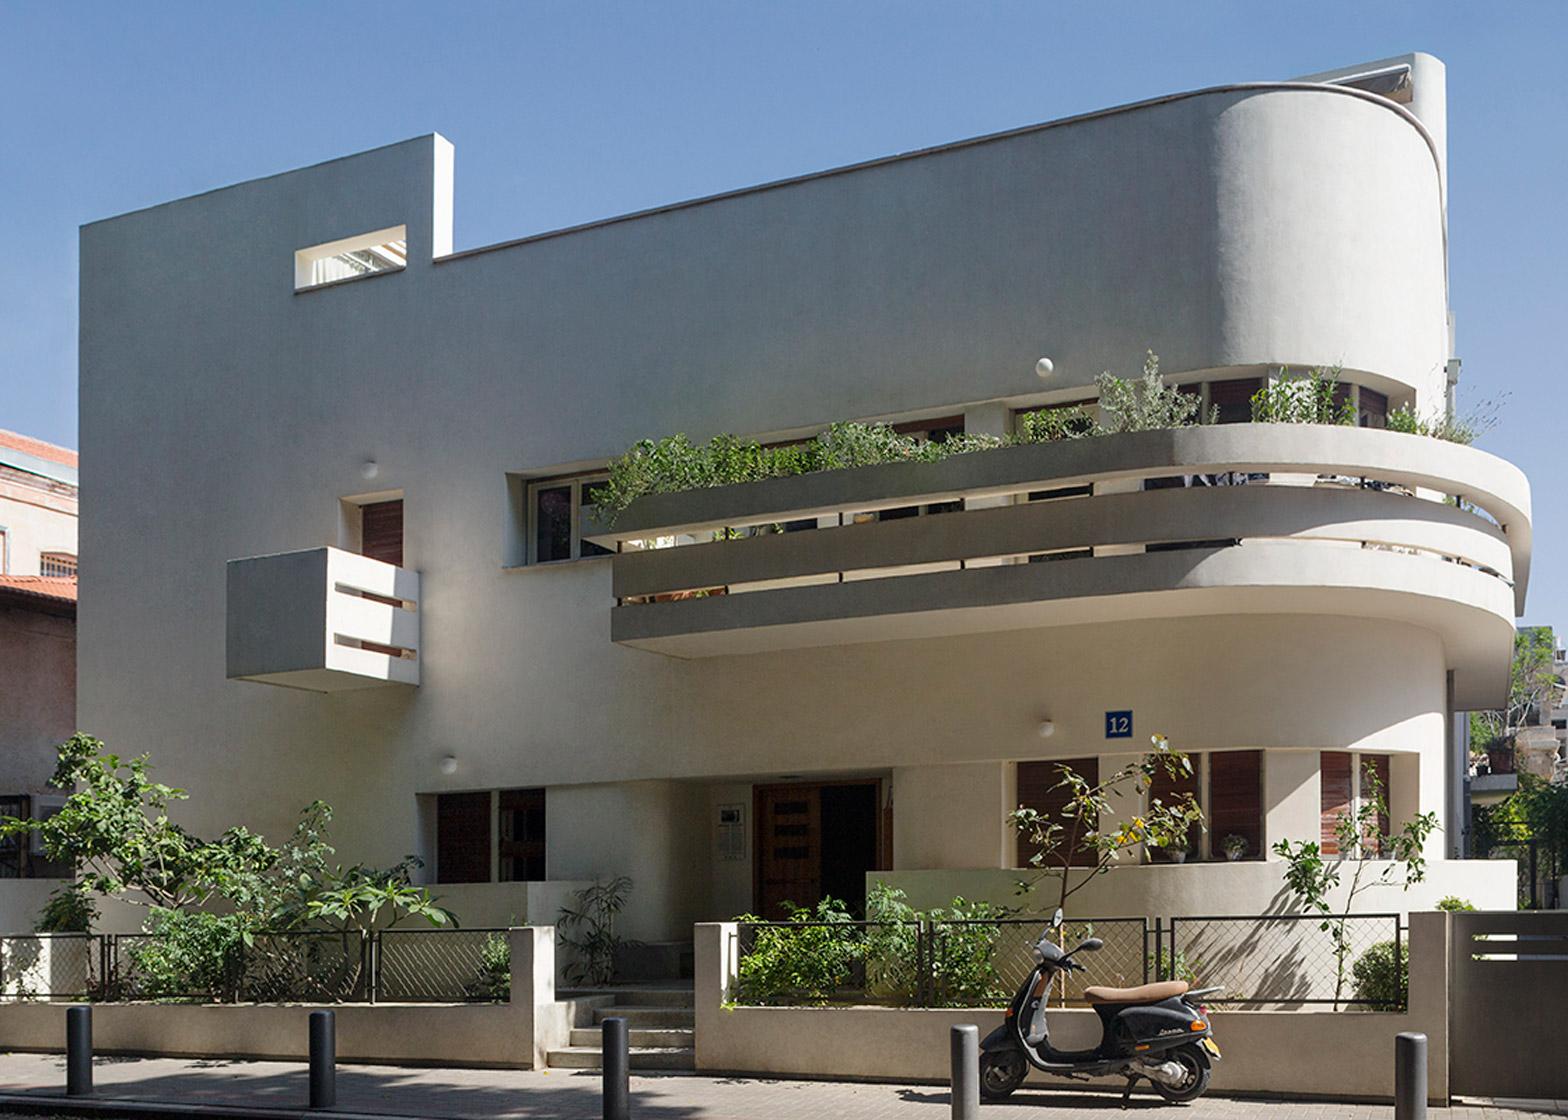 Avraham Soskin House, 12 Lilienblum Street by Zeev Rechter, 1933